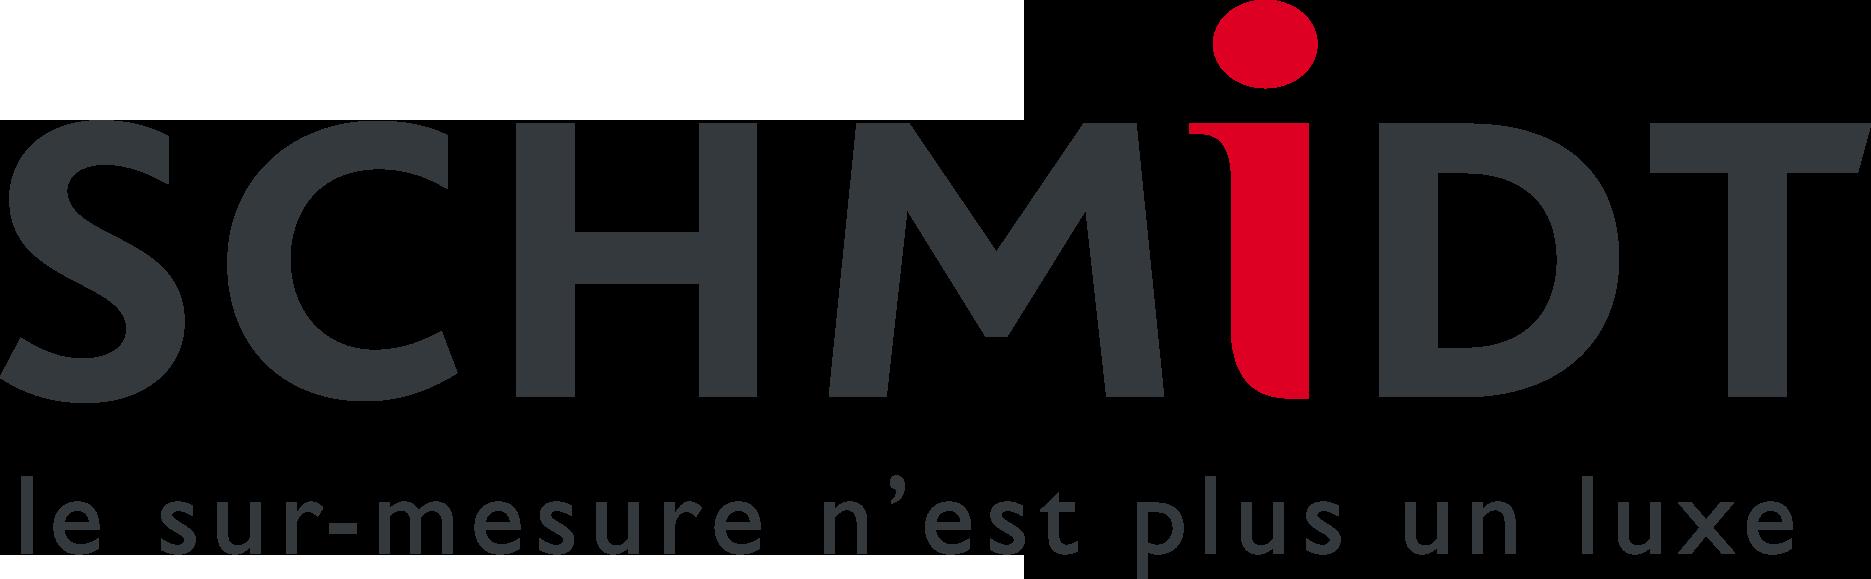 logo_id.png